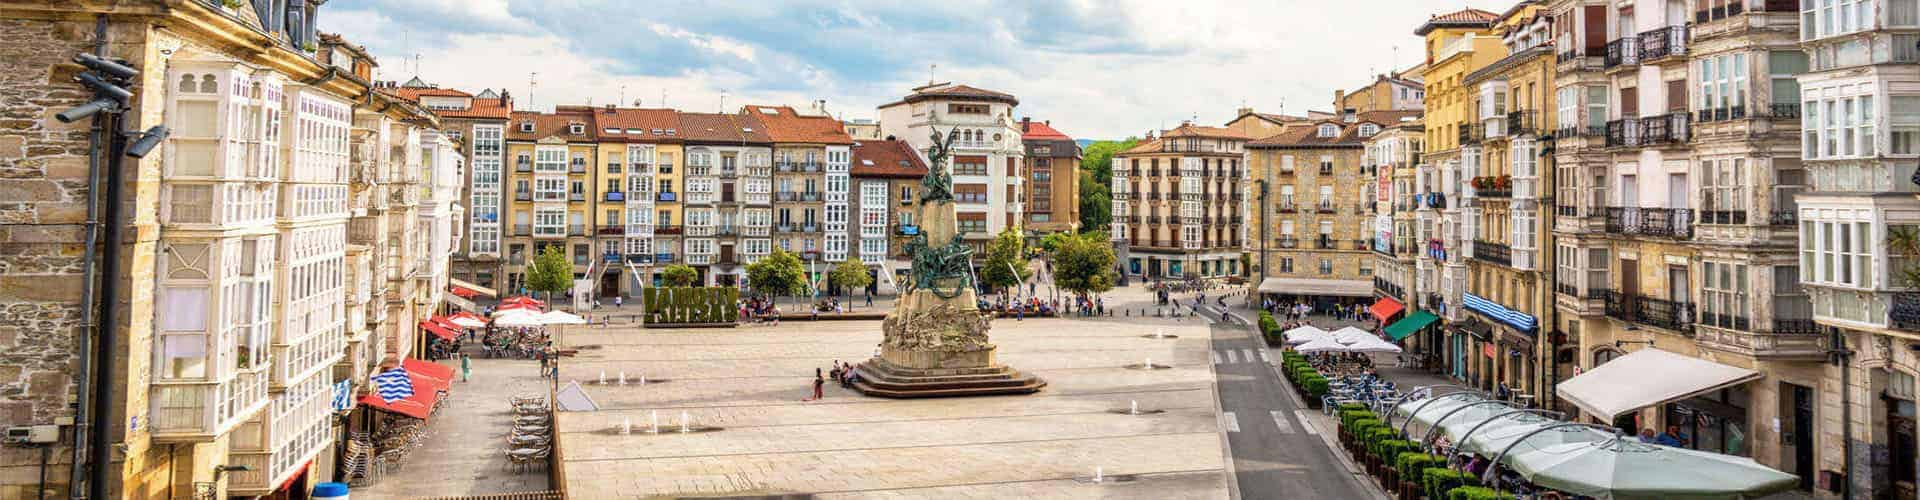 Visitas guiadas por Vitoria - Turismo de España